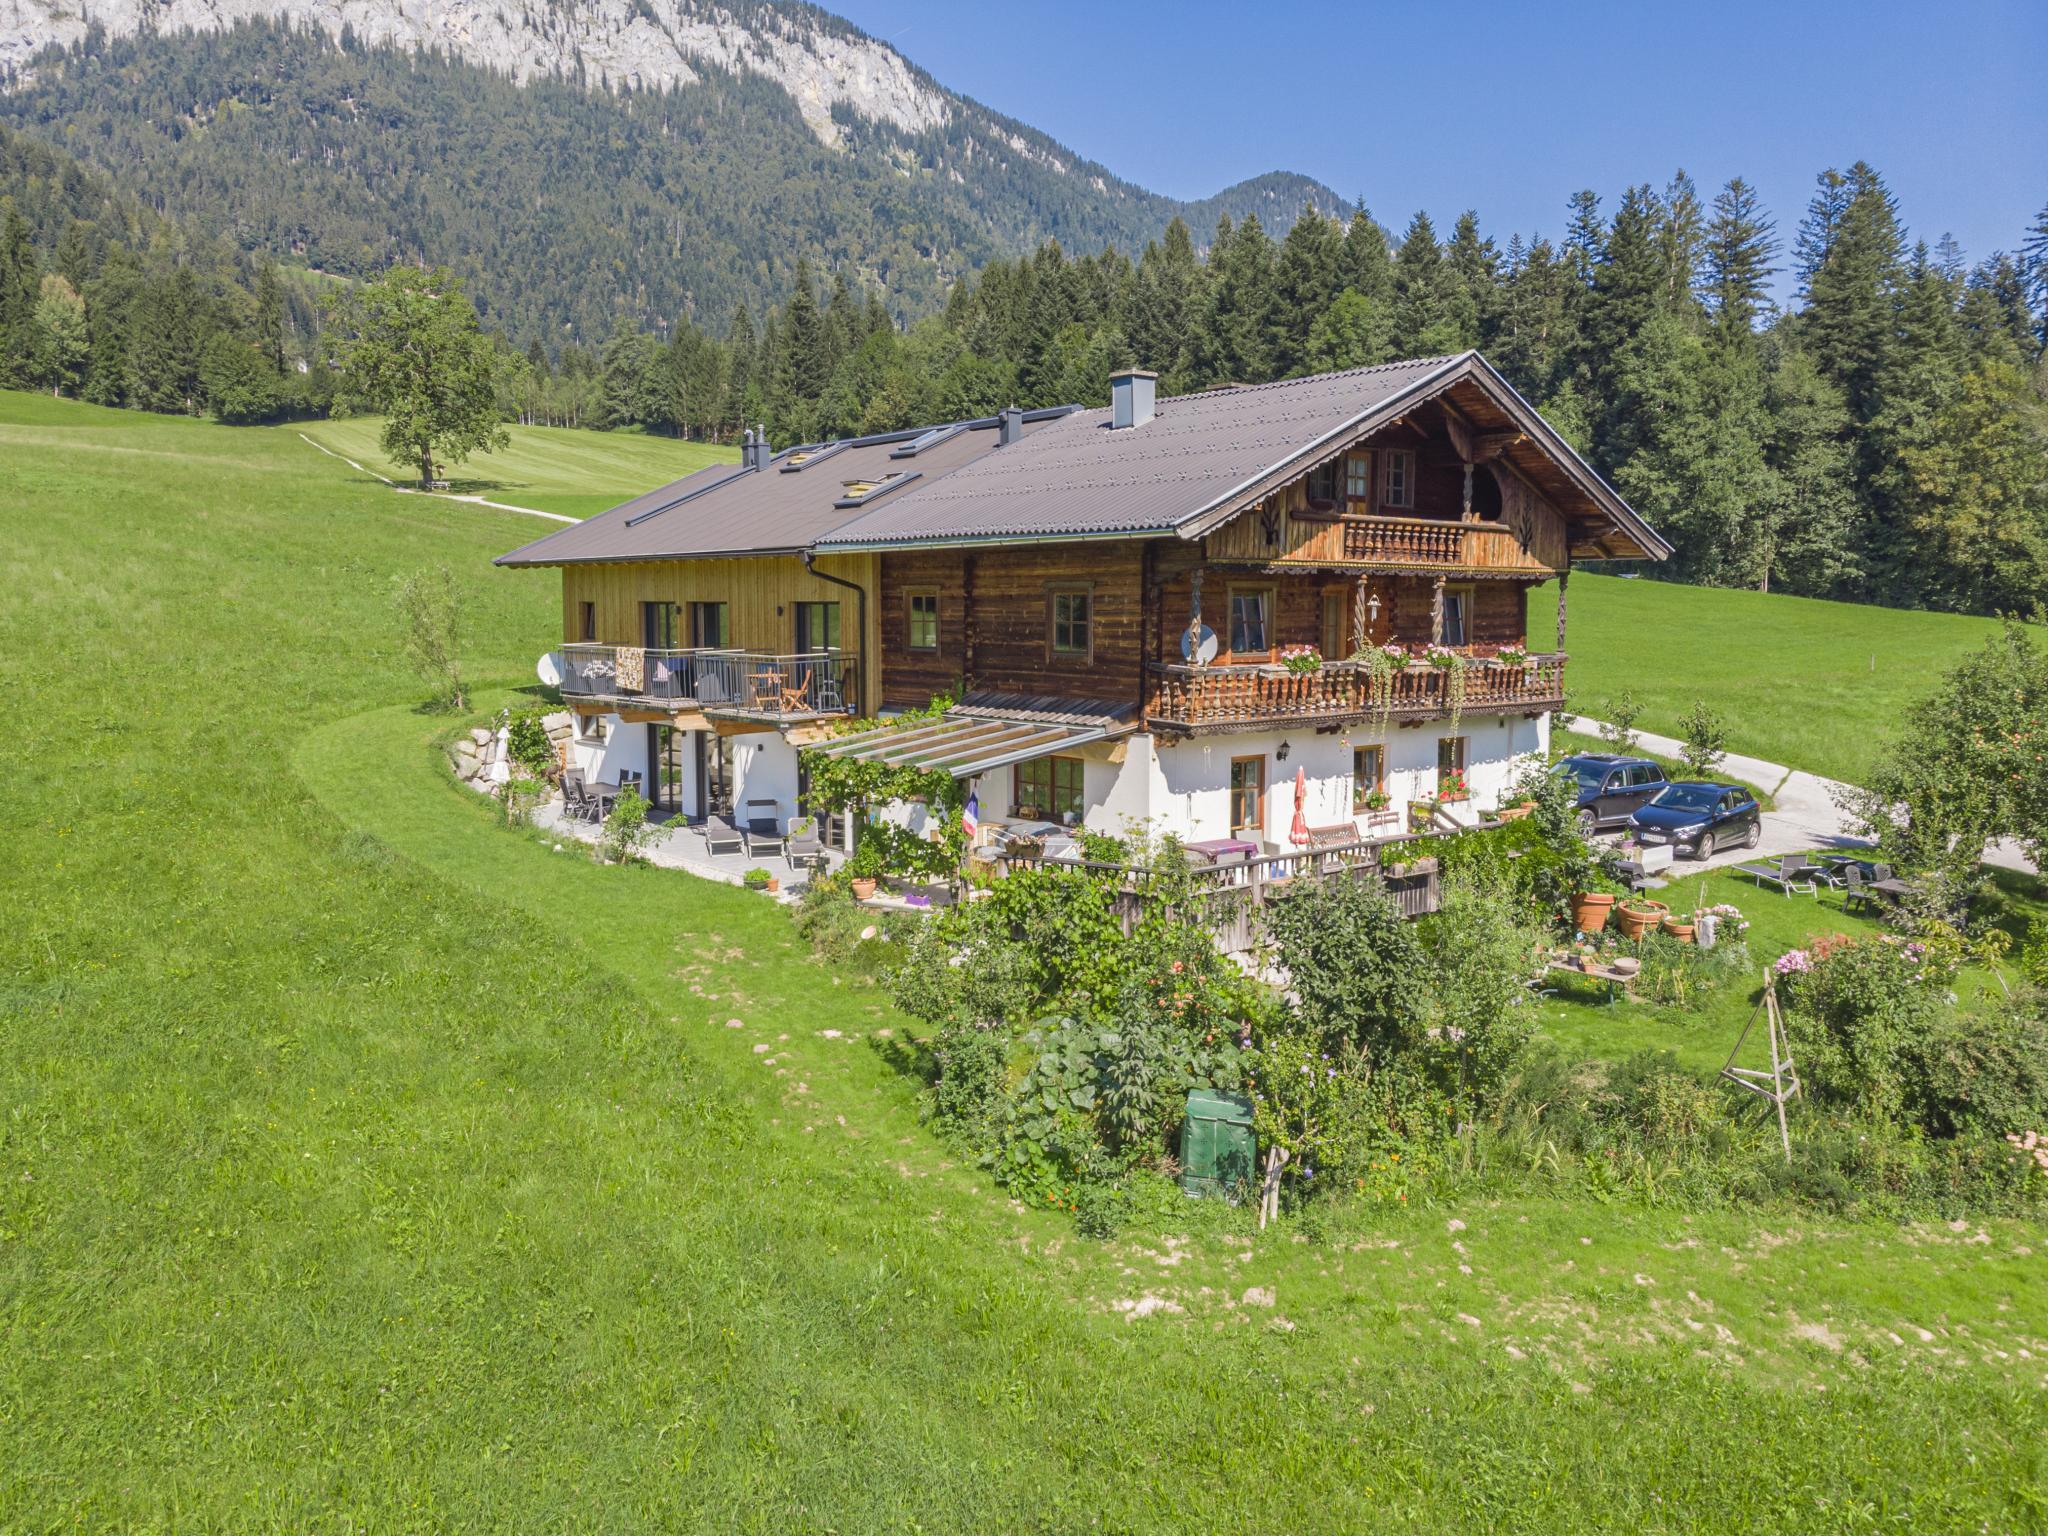 Ferienhaus Rabl Tirol